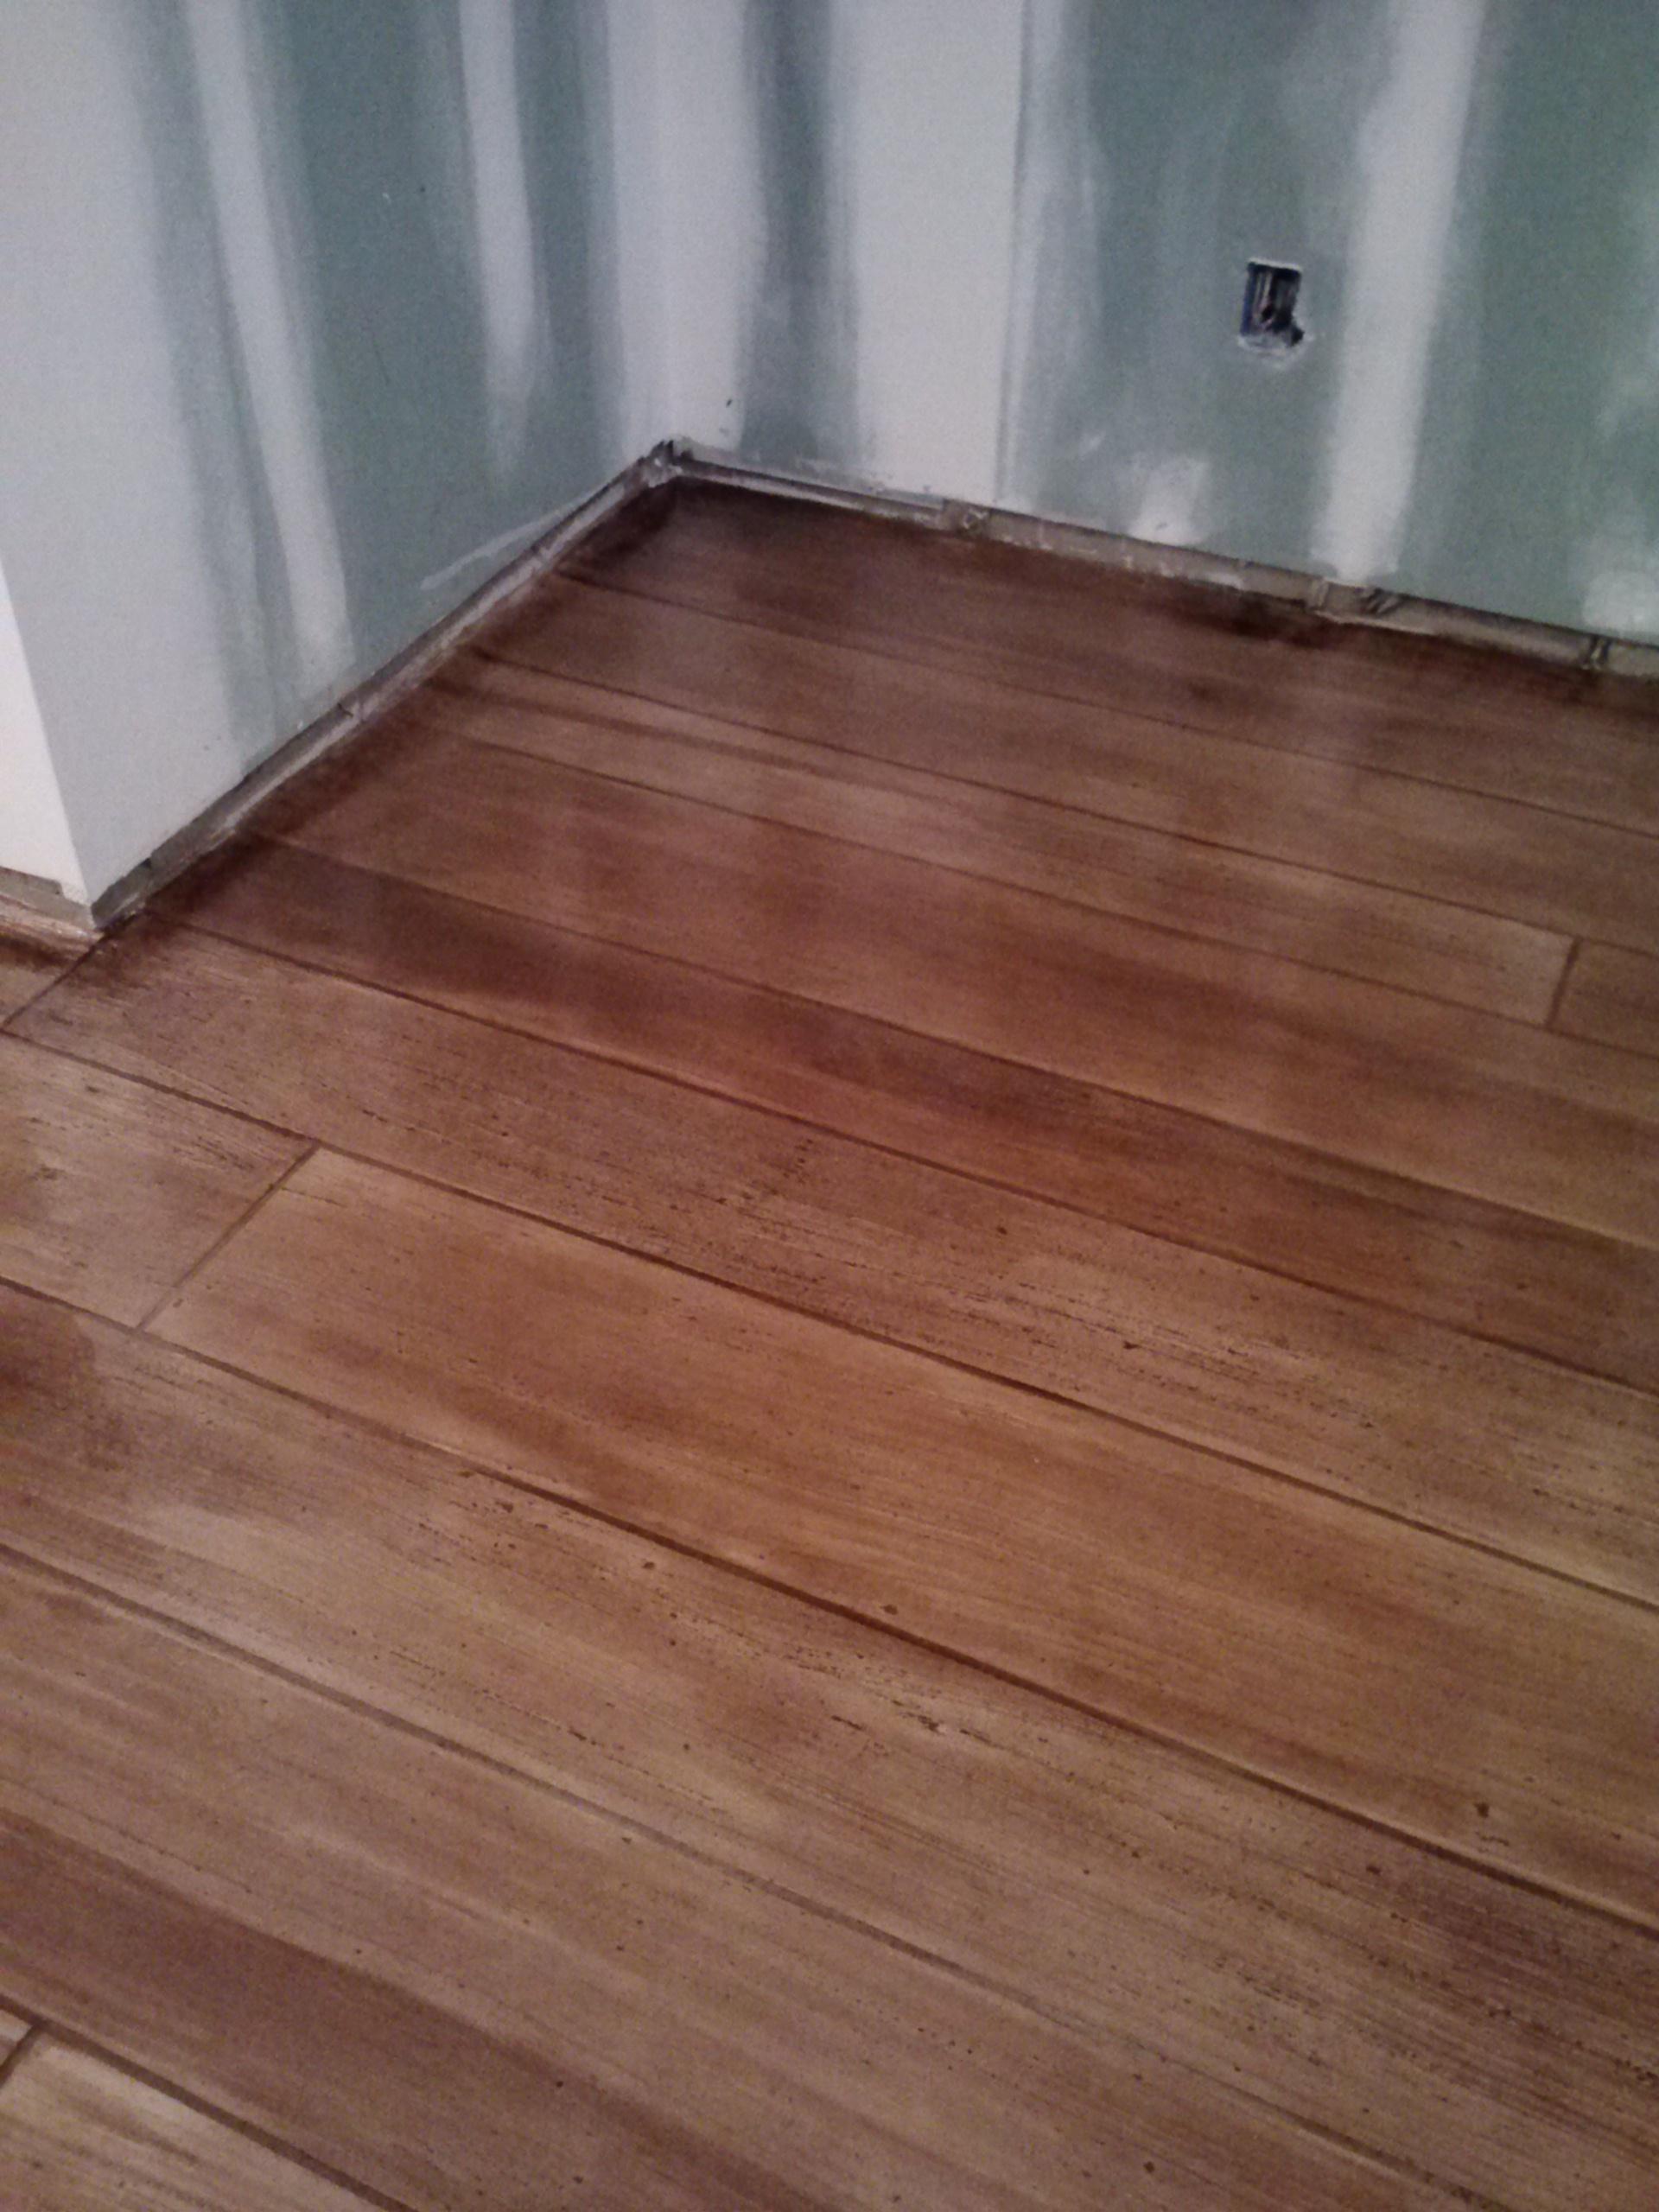 Rustic Concrete Wood Basement - Ardmore, PA